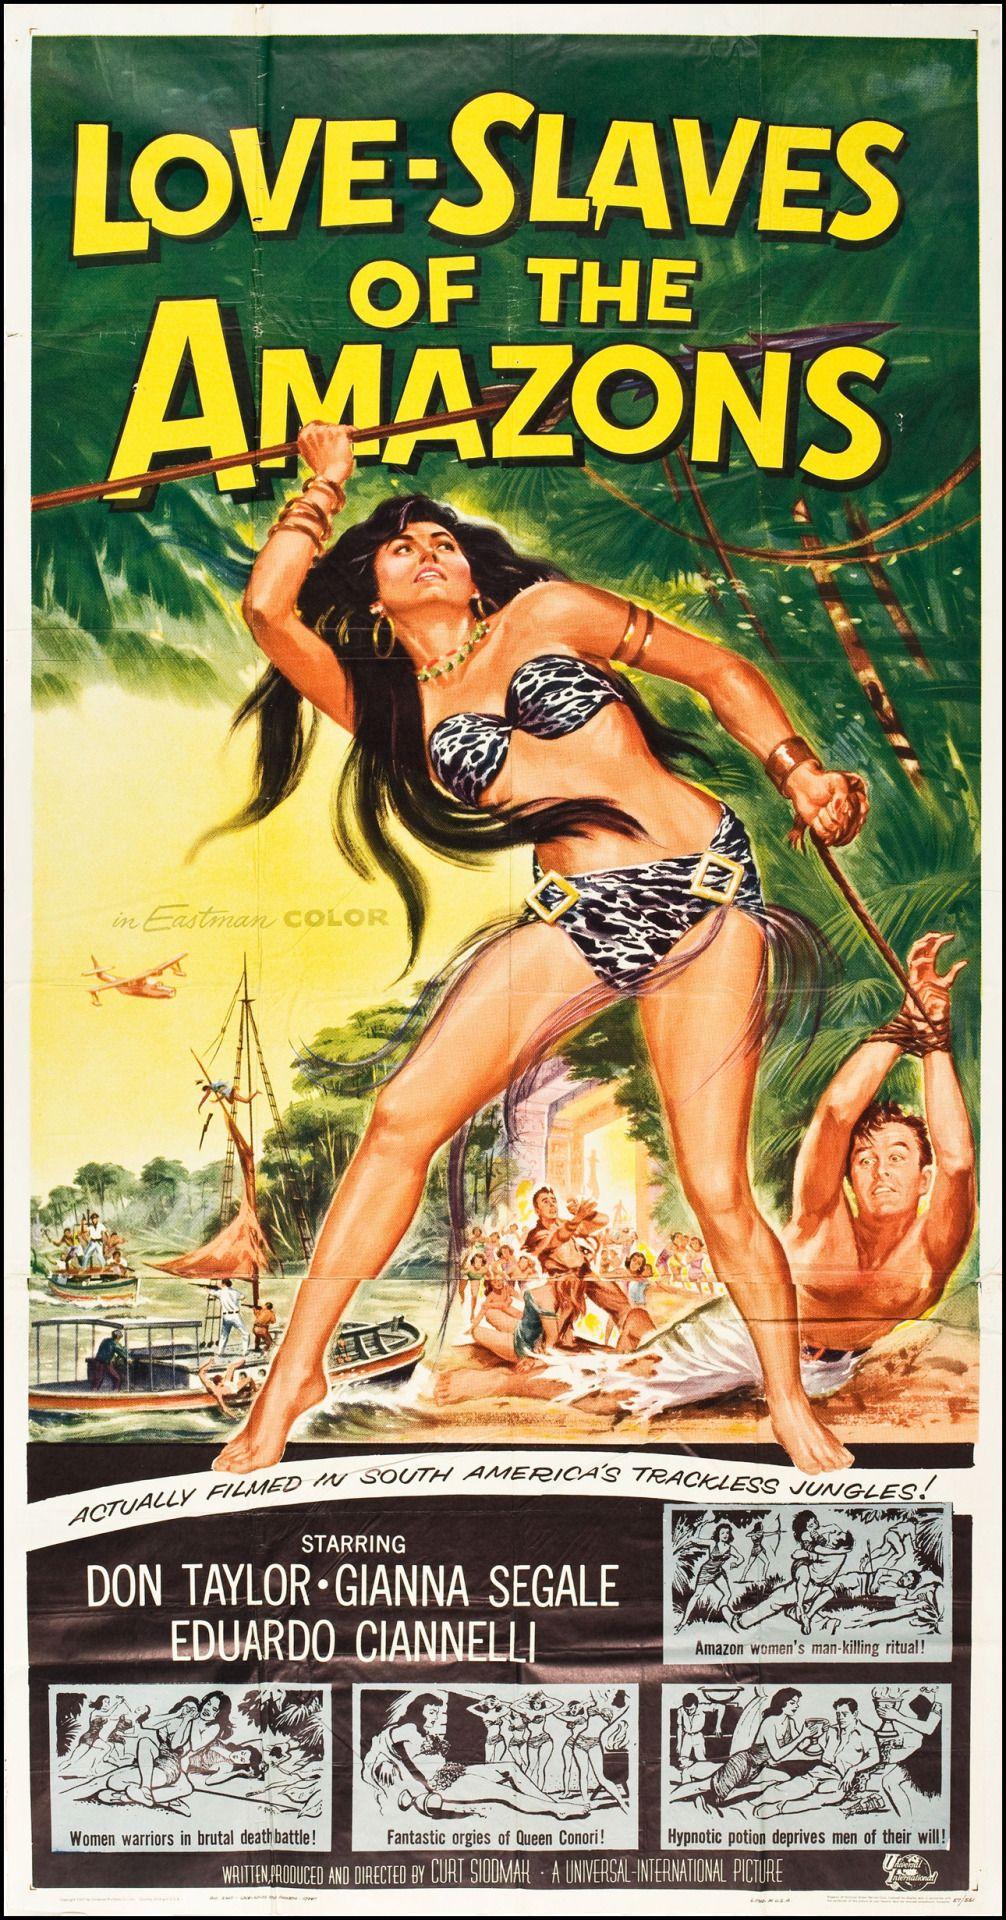 MOVIE FILM LOVE SLAVES AMAZONS JUNGLE SPEAR ADVENTURE FRAMED ART PRINT B12X5535